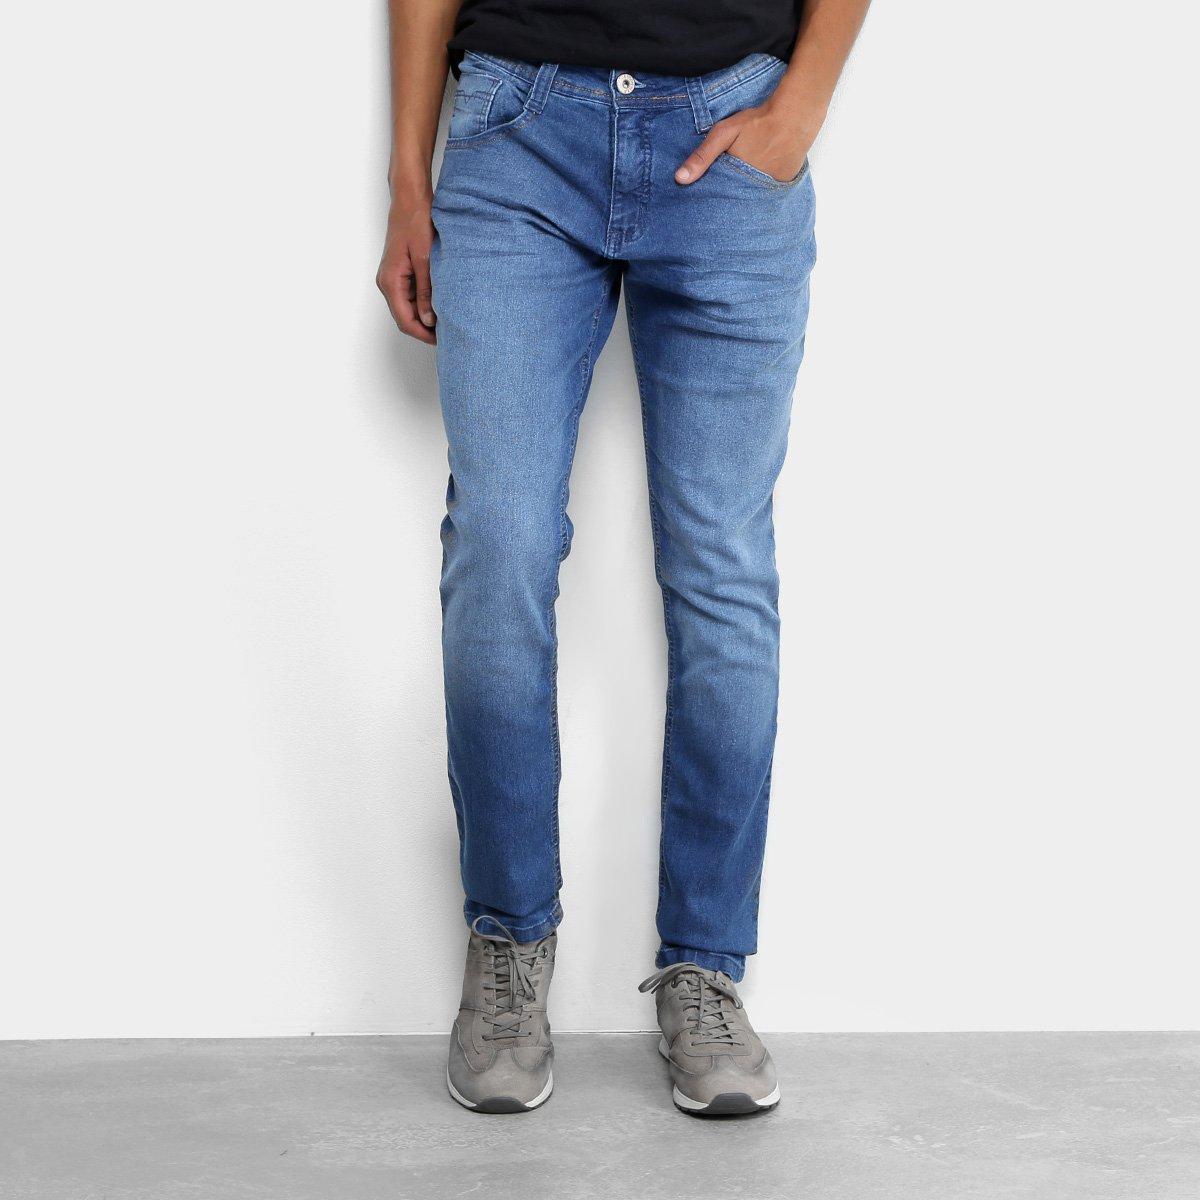 d94fd46121 Calça Jeans Skinny Biotipo Estonada Masculina - Azul Claro - Compre Agora